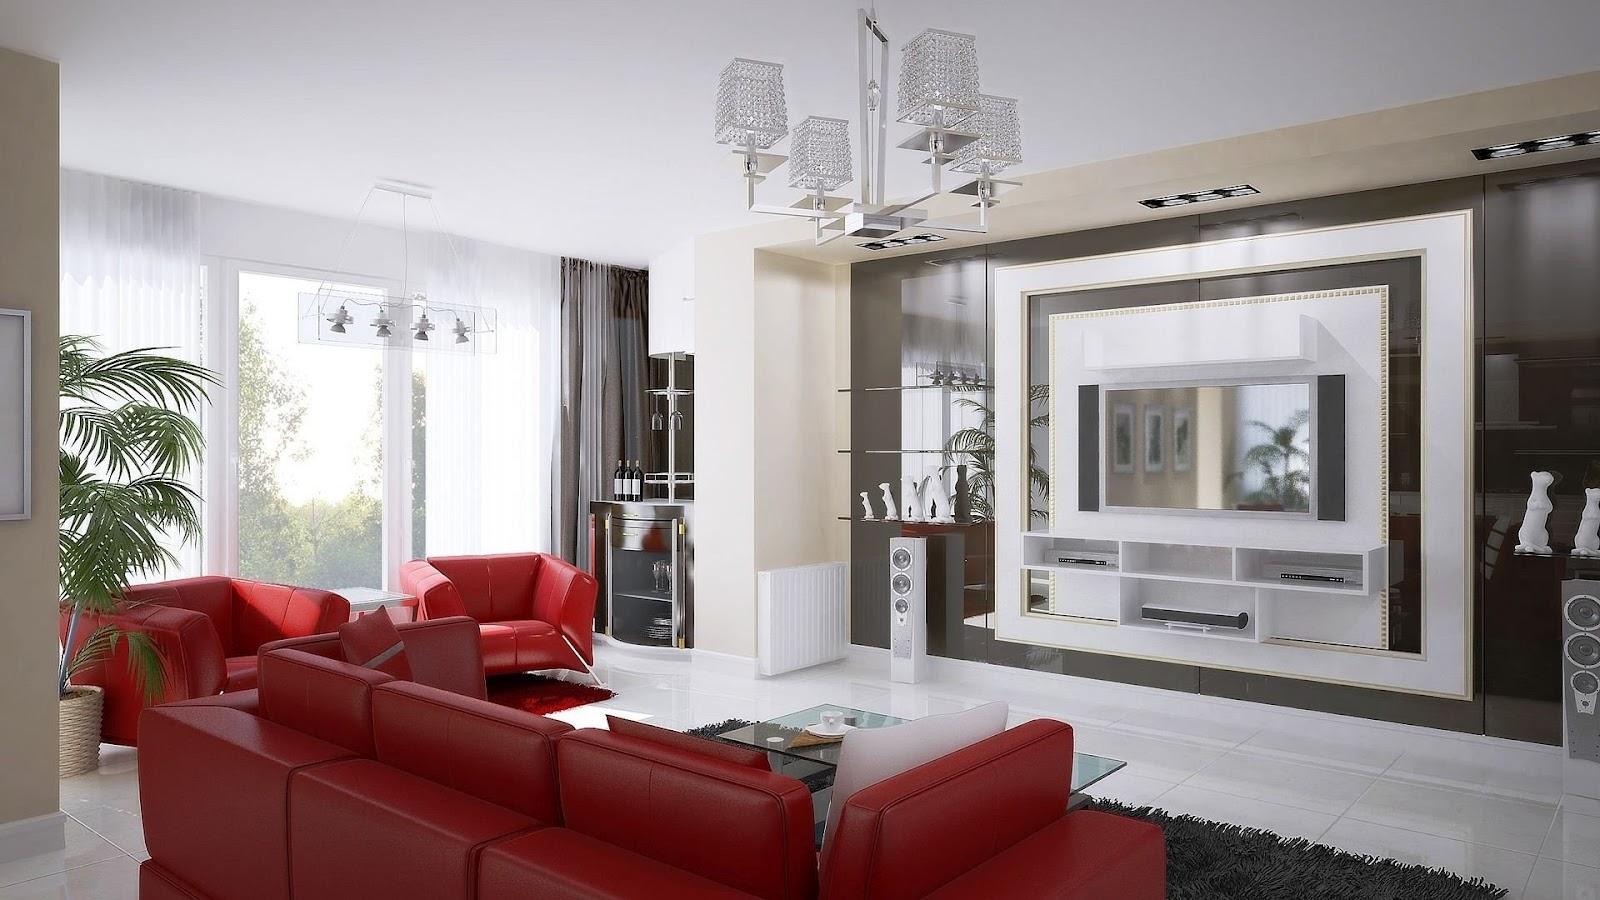 http://3.bp.blogspot.com/-Zdm6D9tQkv8/UCqbsFcSF6I/AAAAAAAADxI/mG3xSkHy2EU/s1600/luxurious-living-room-1920x1080.jpg